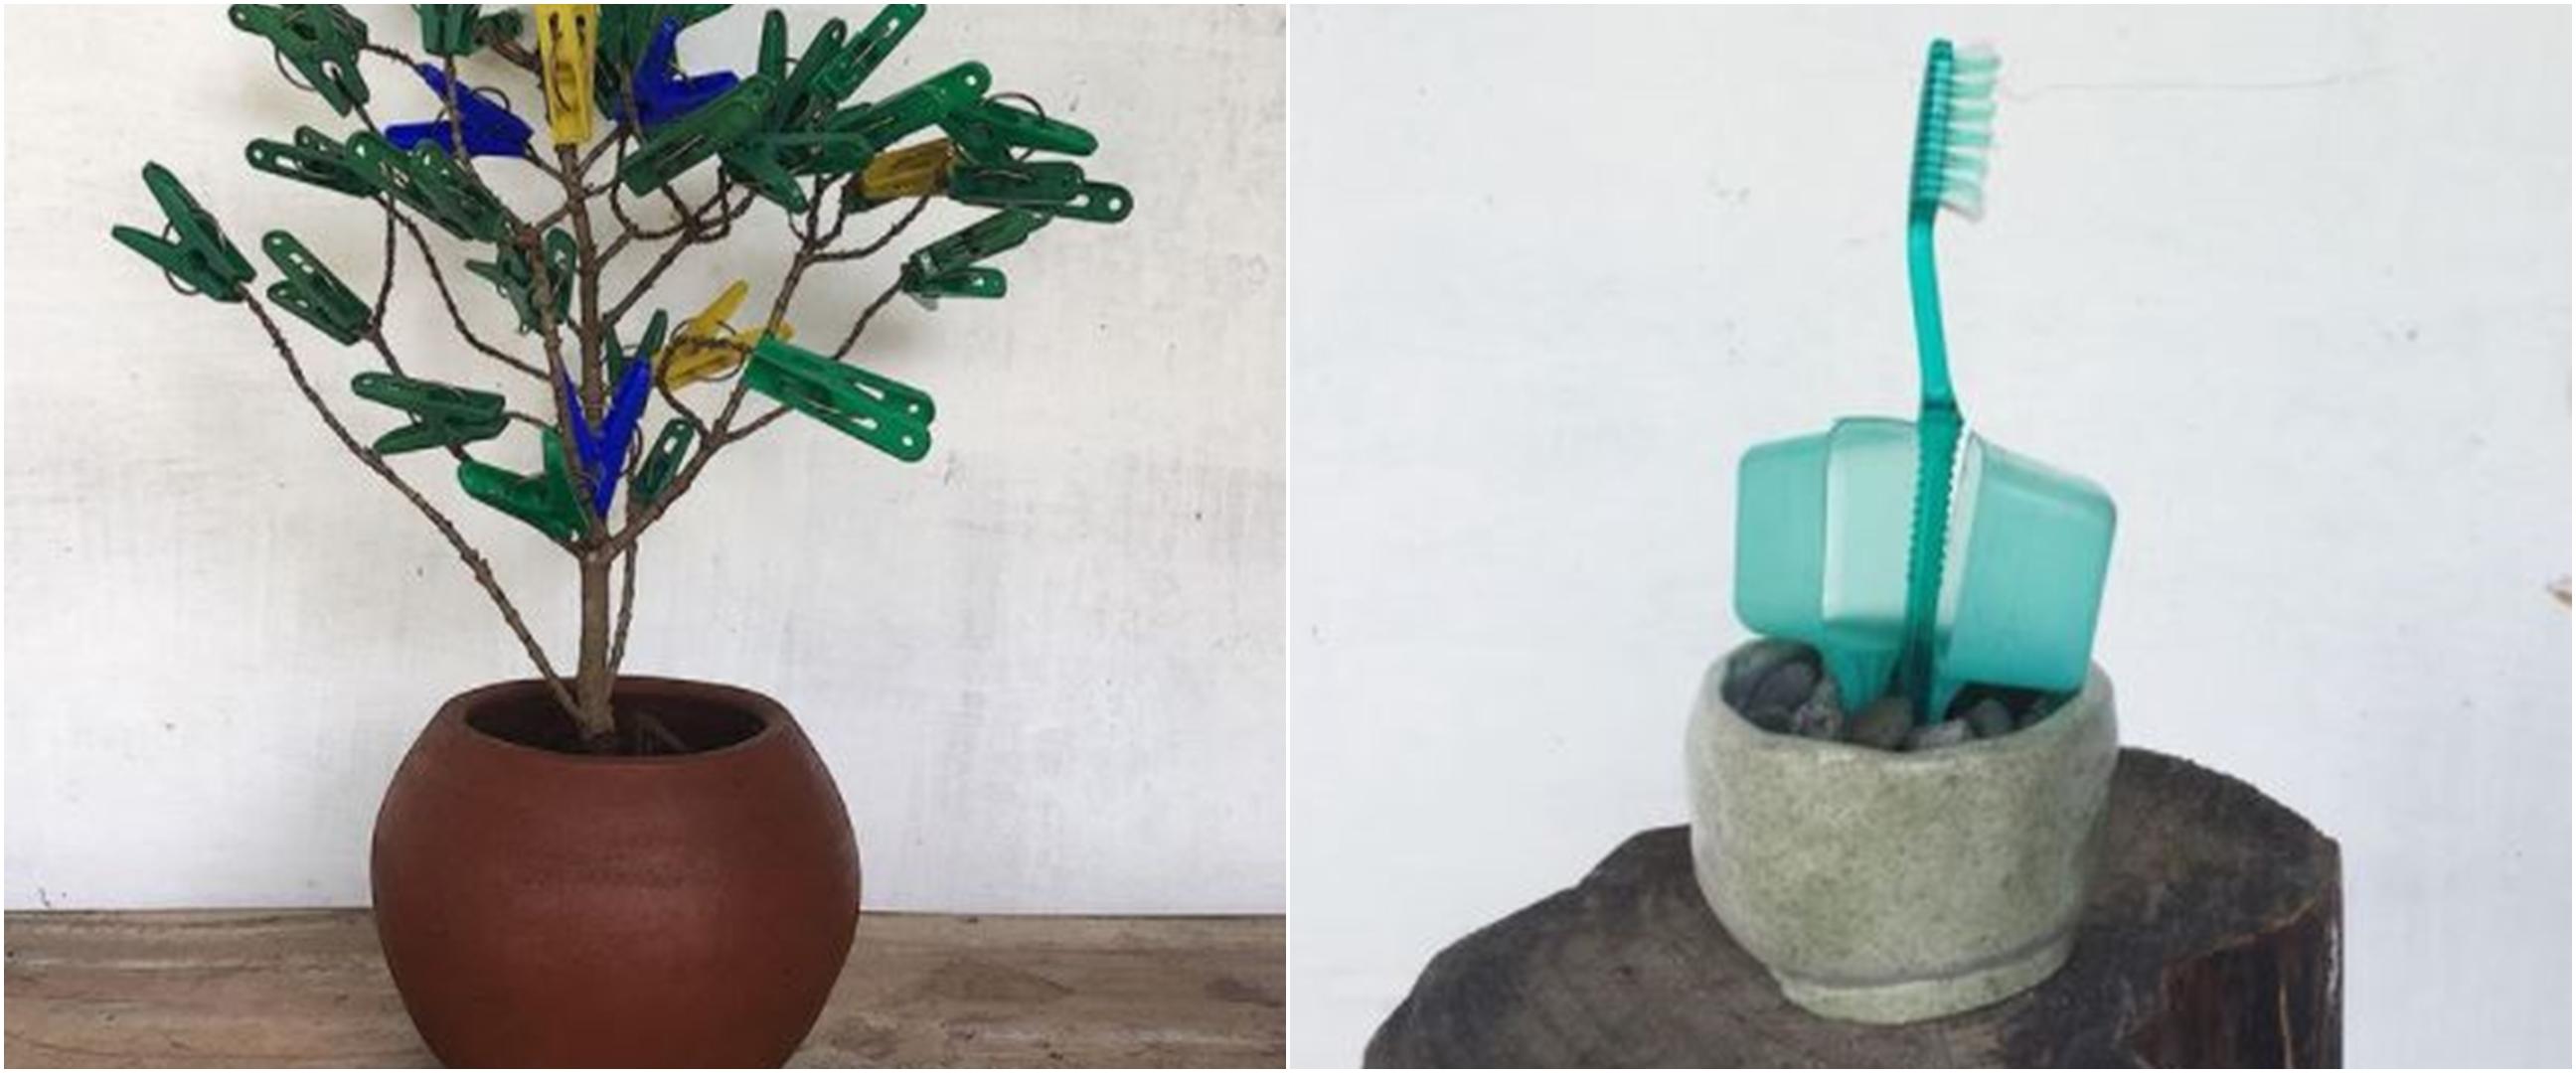 10 Potret lucu tanaman bukan dari tumbuhan ini kelewat kreatif